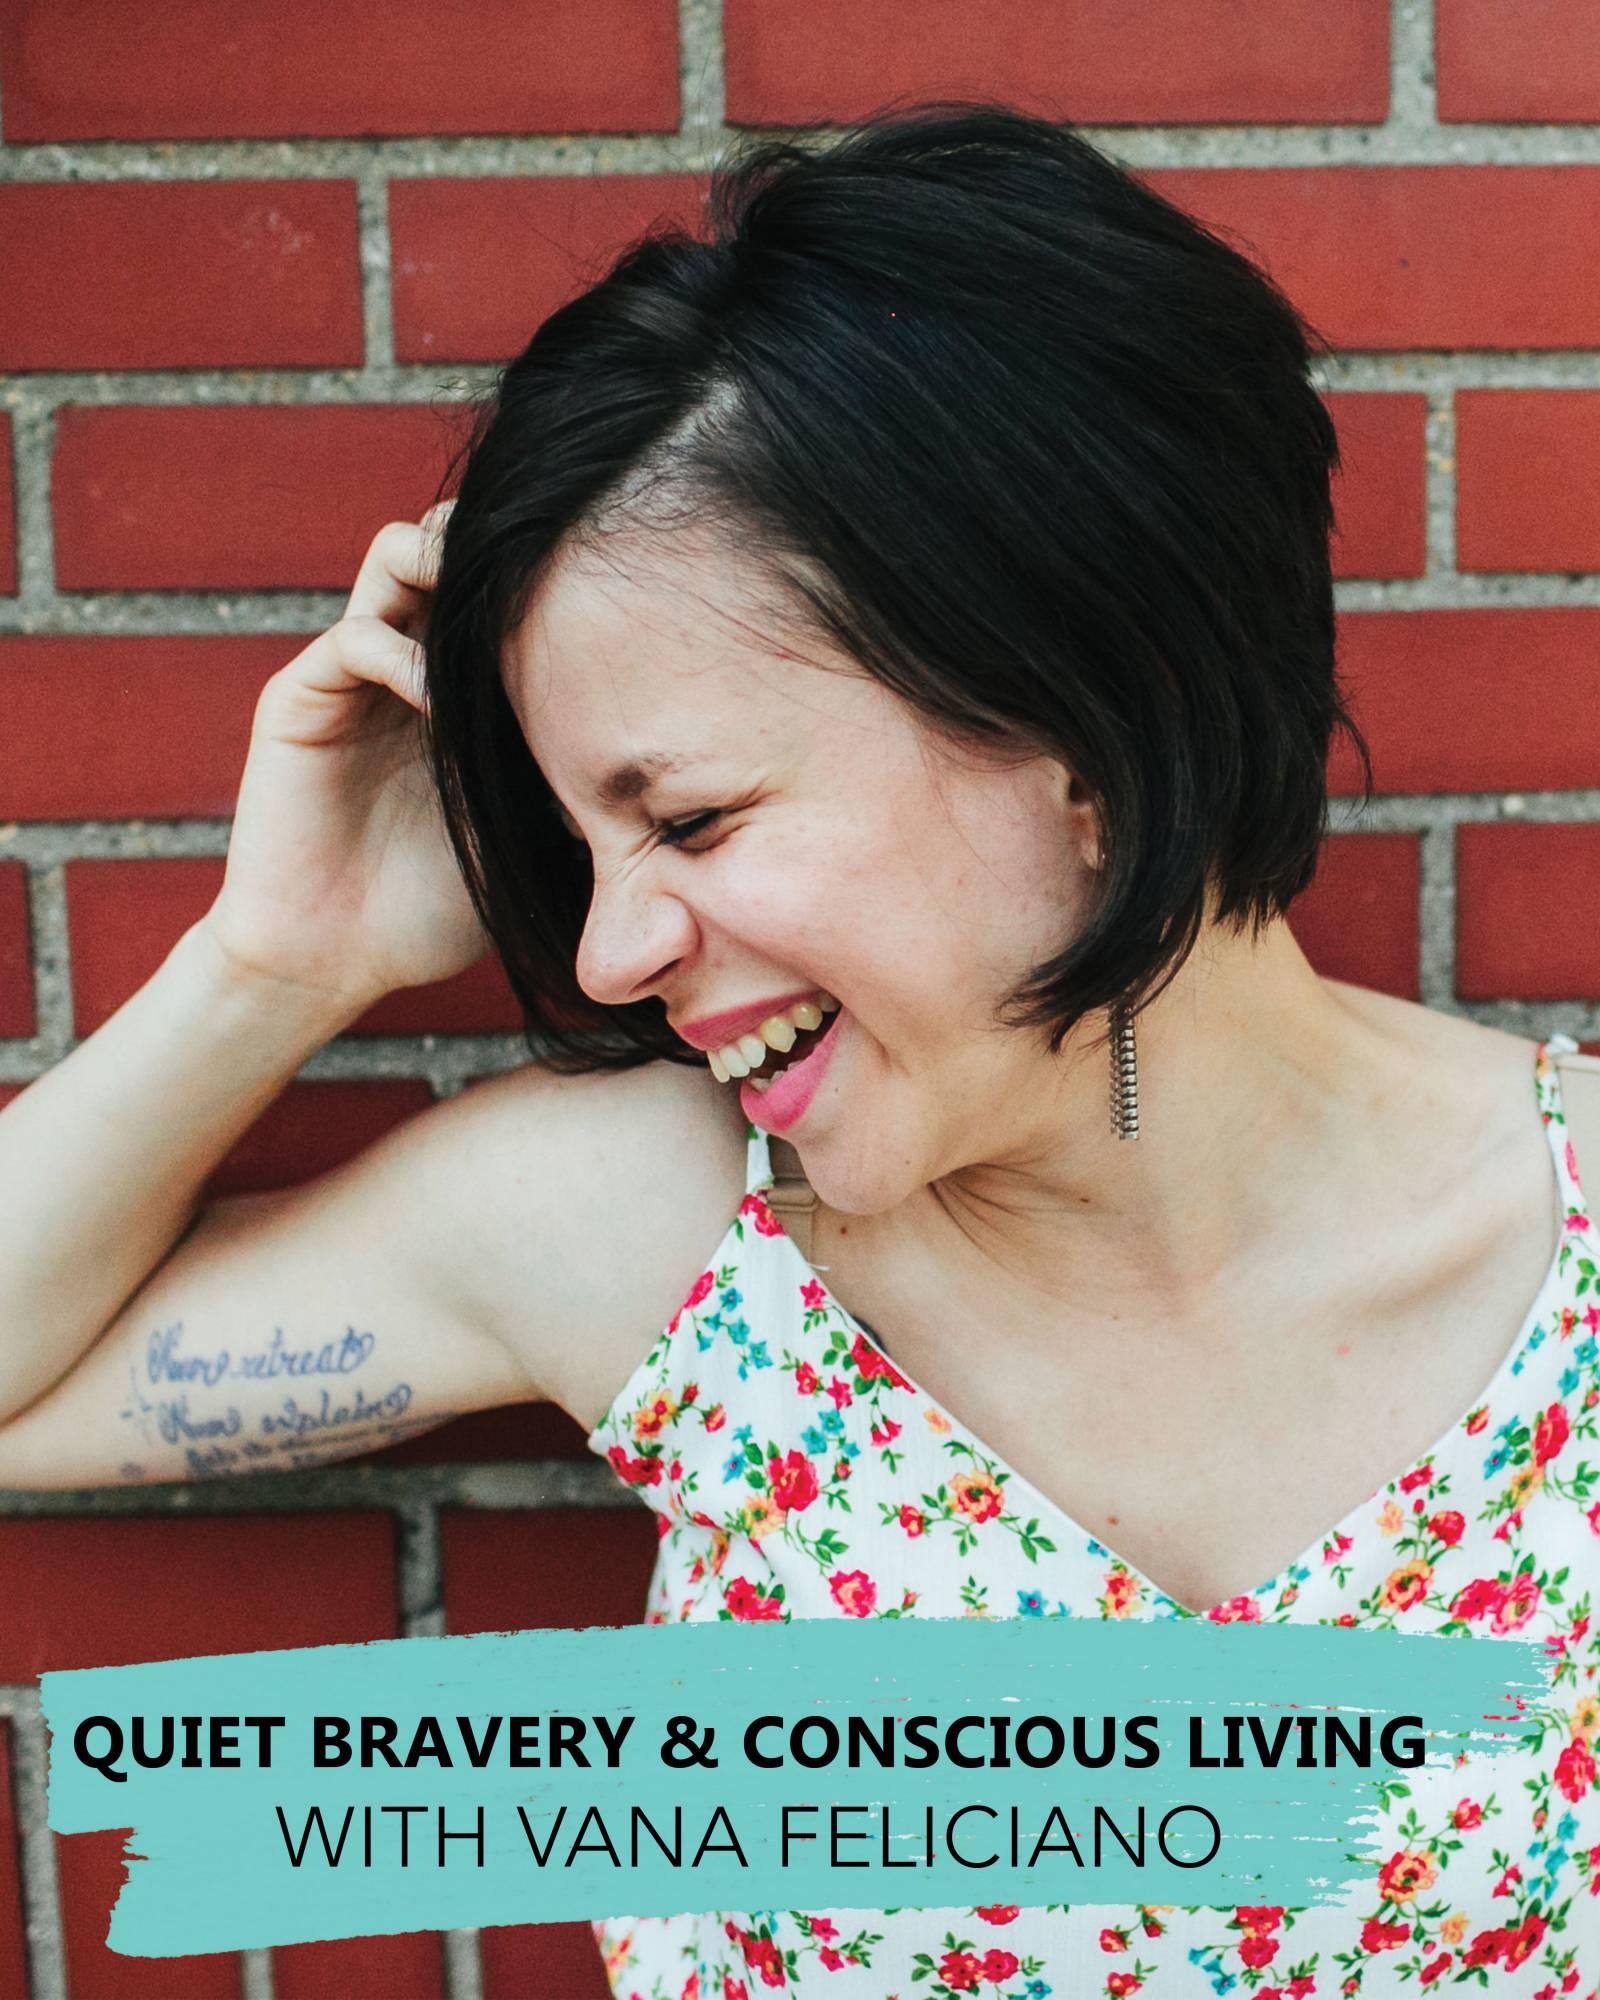 quiet-bravery-conscious-living-with-vana-feliciano.jpg